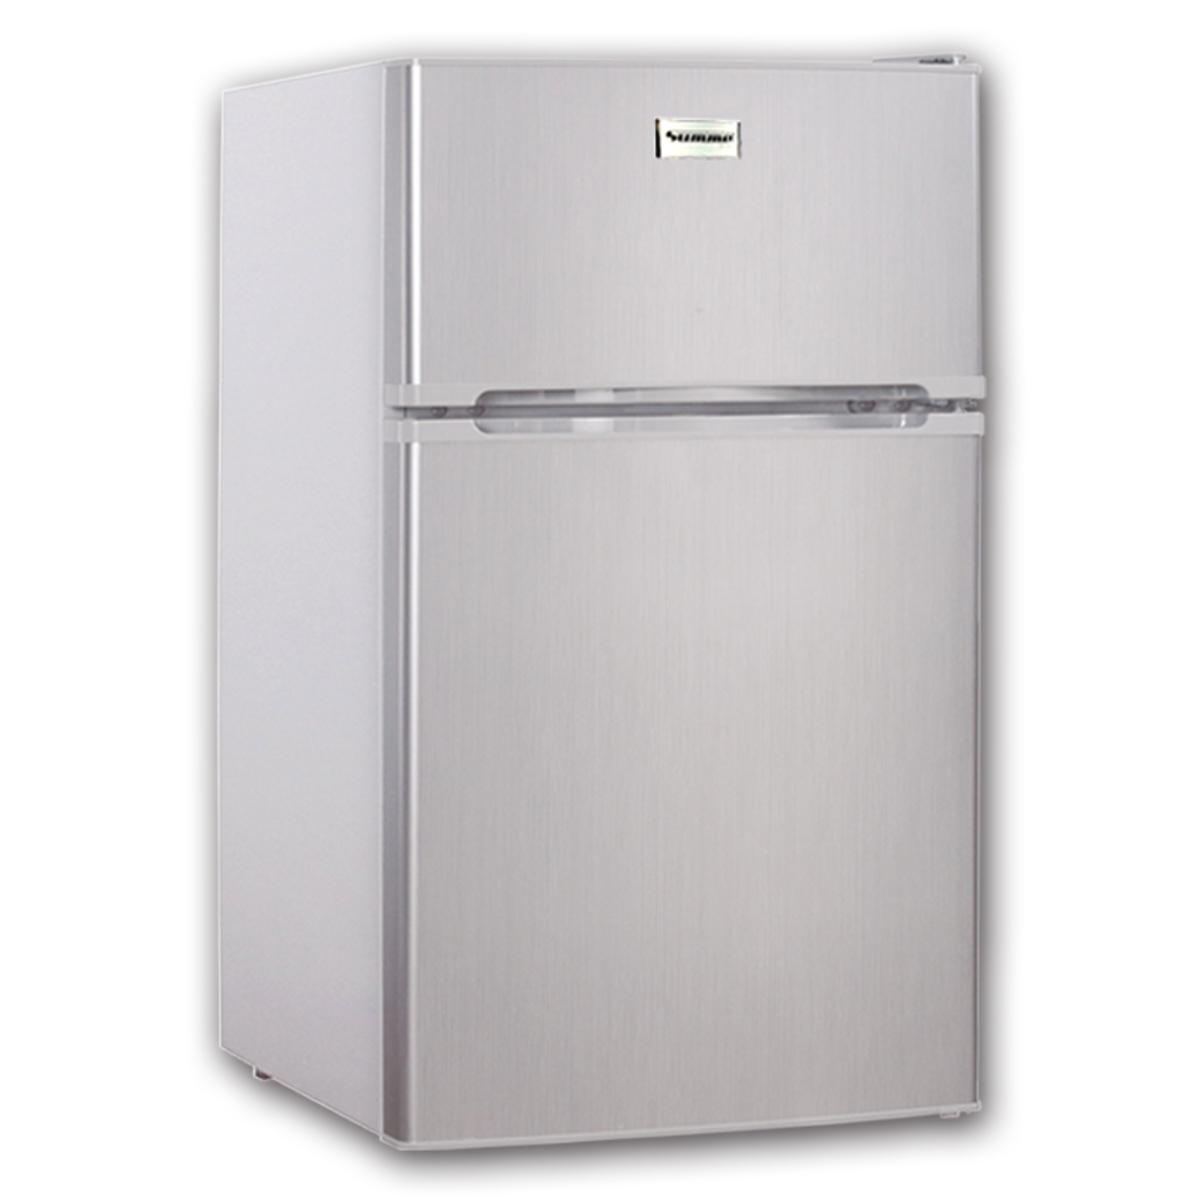 Double door refrigerator SRF-883DD